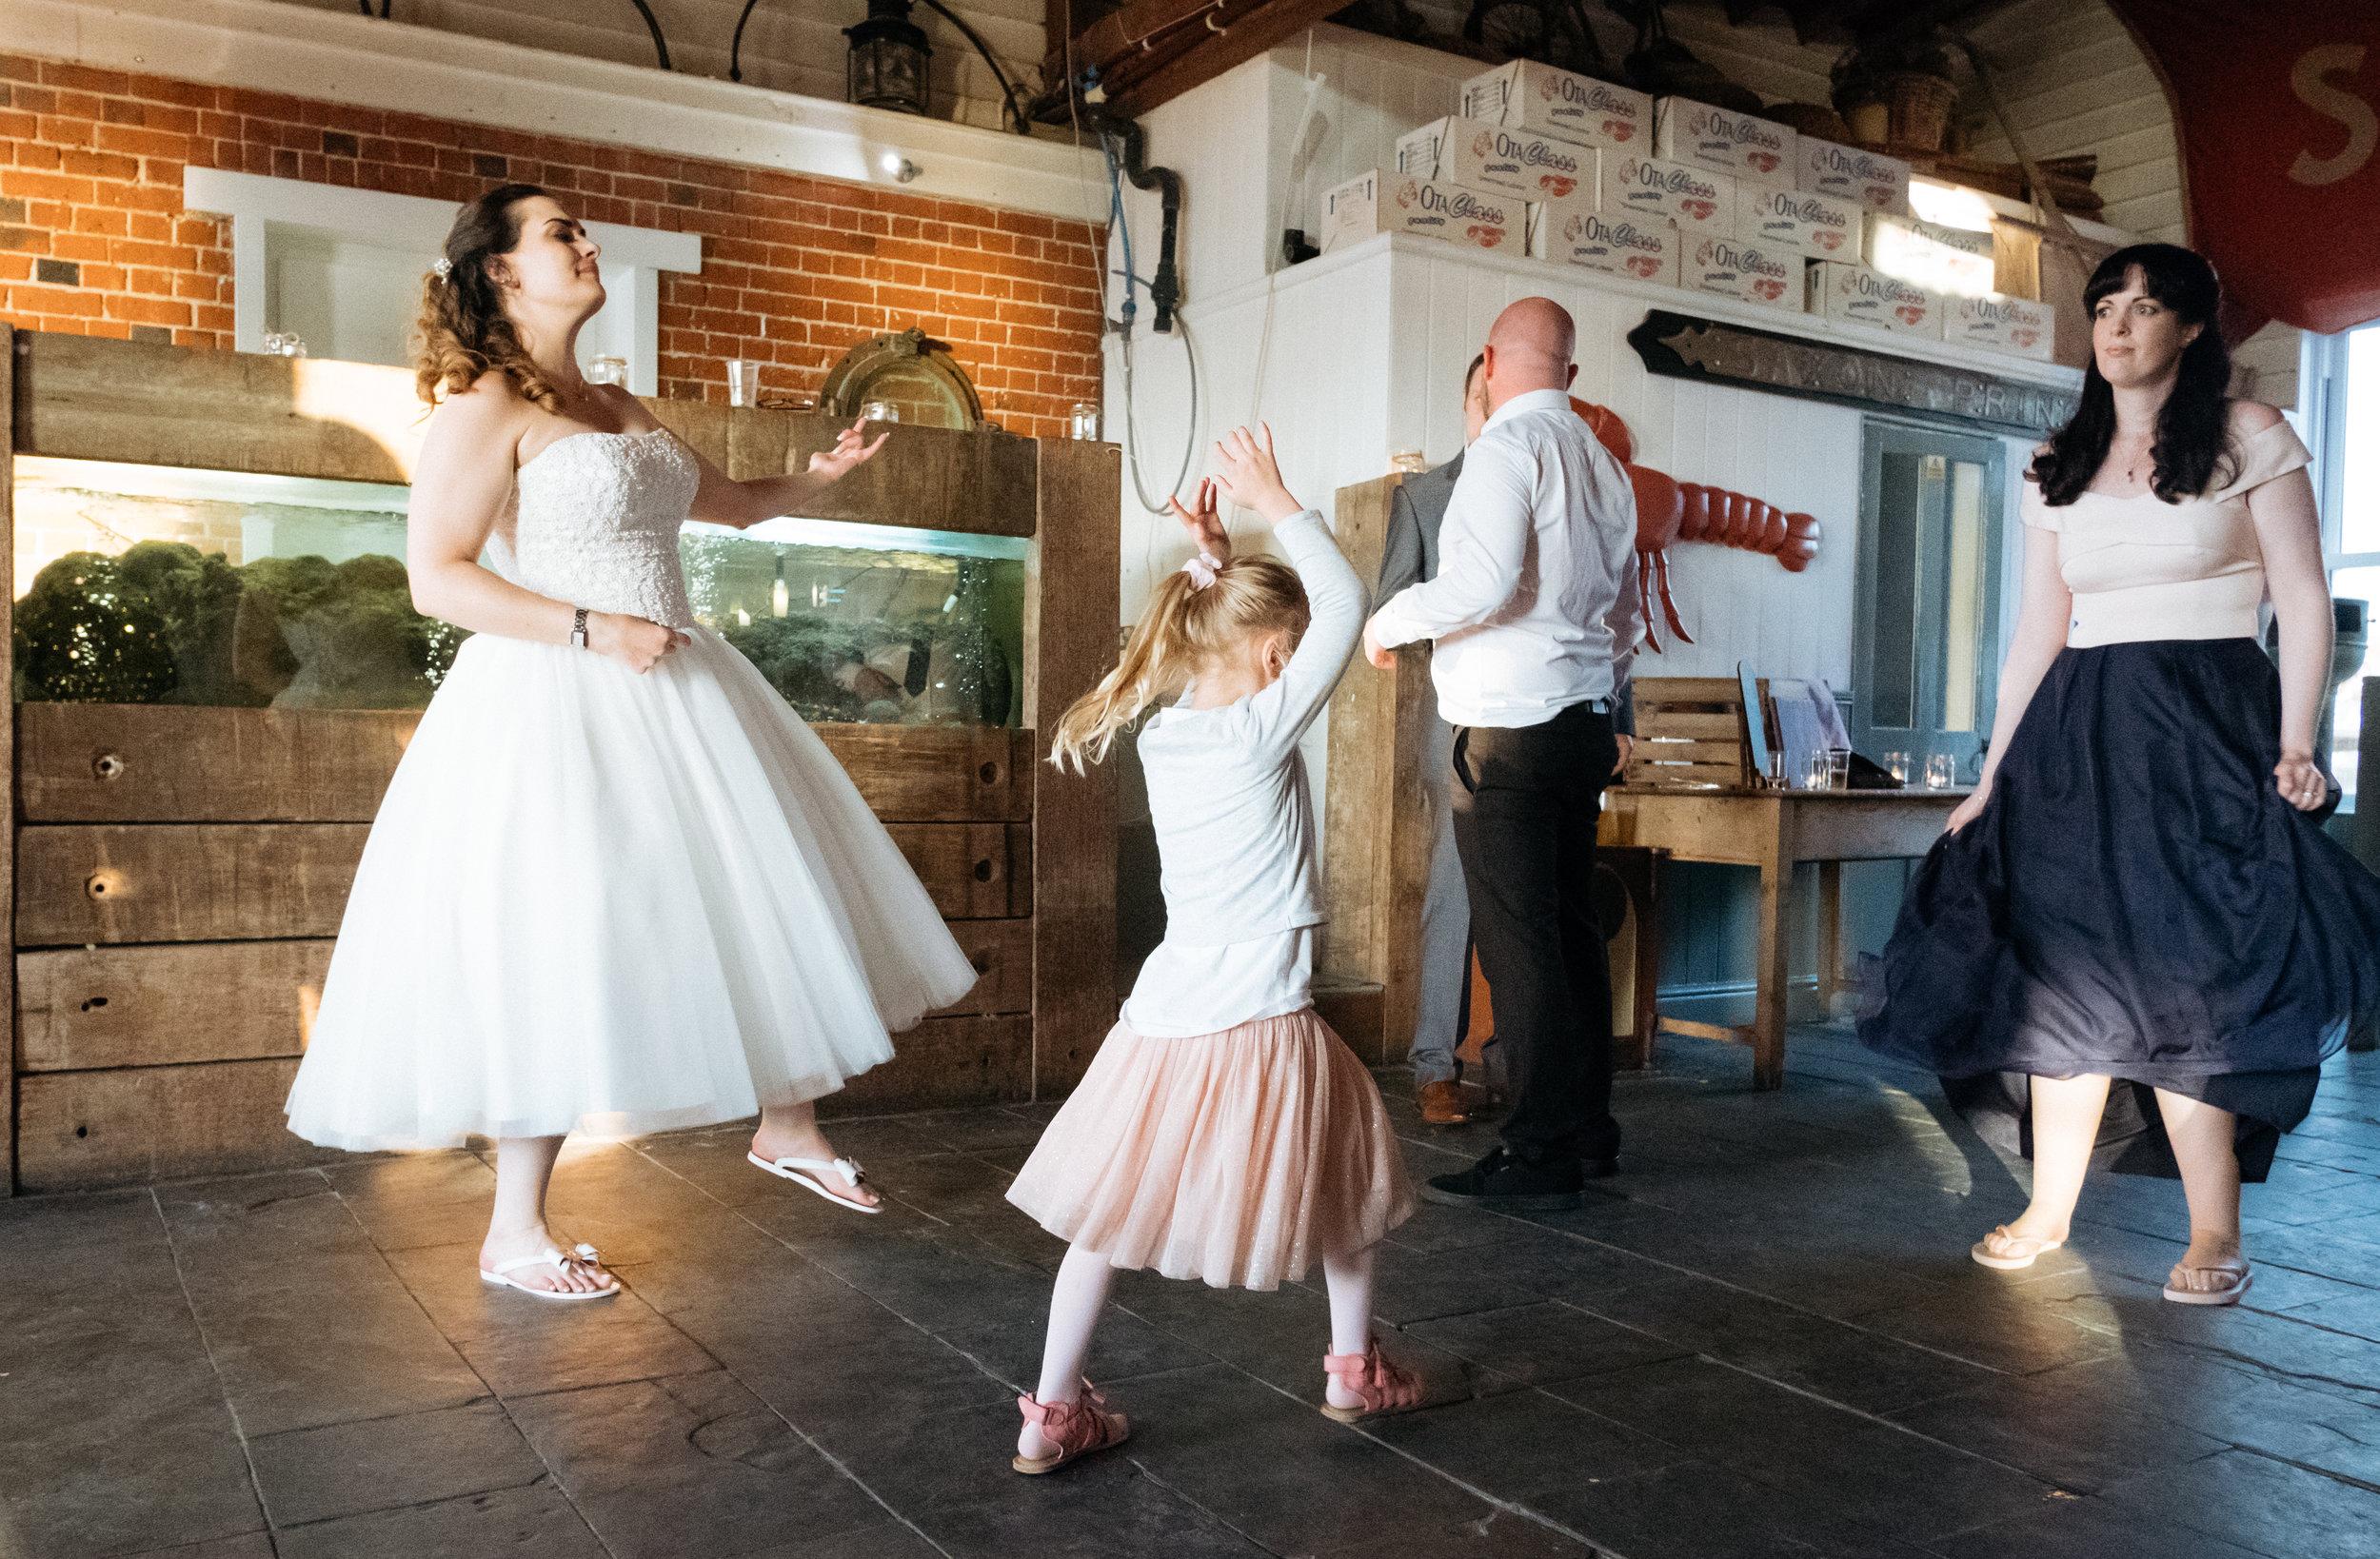 Air guitar dancing at East Quay wedding venue